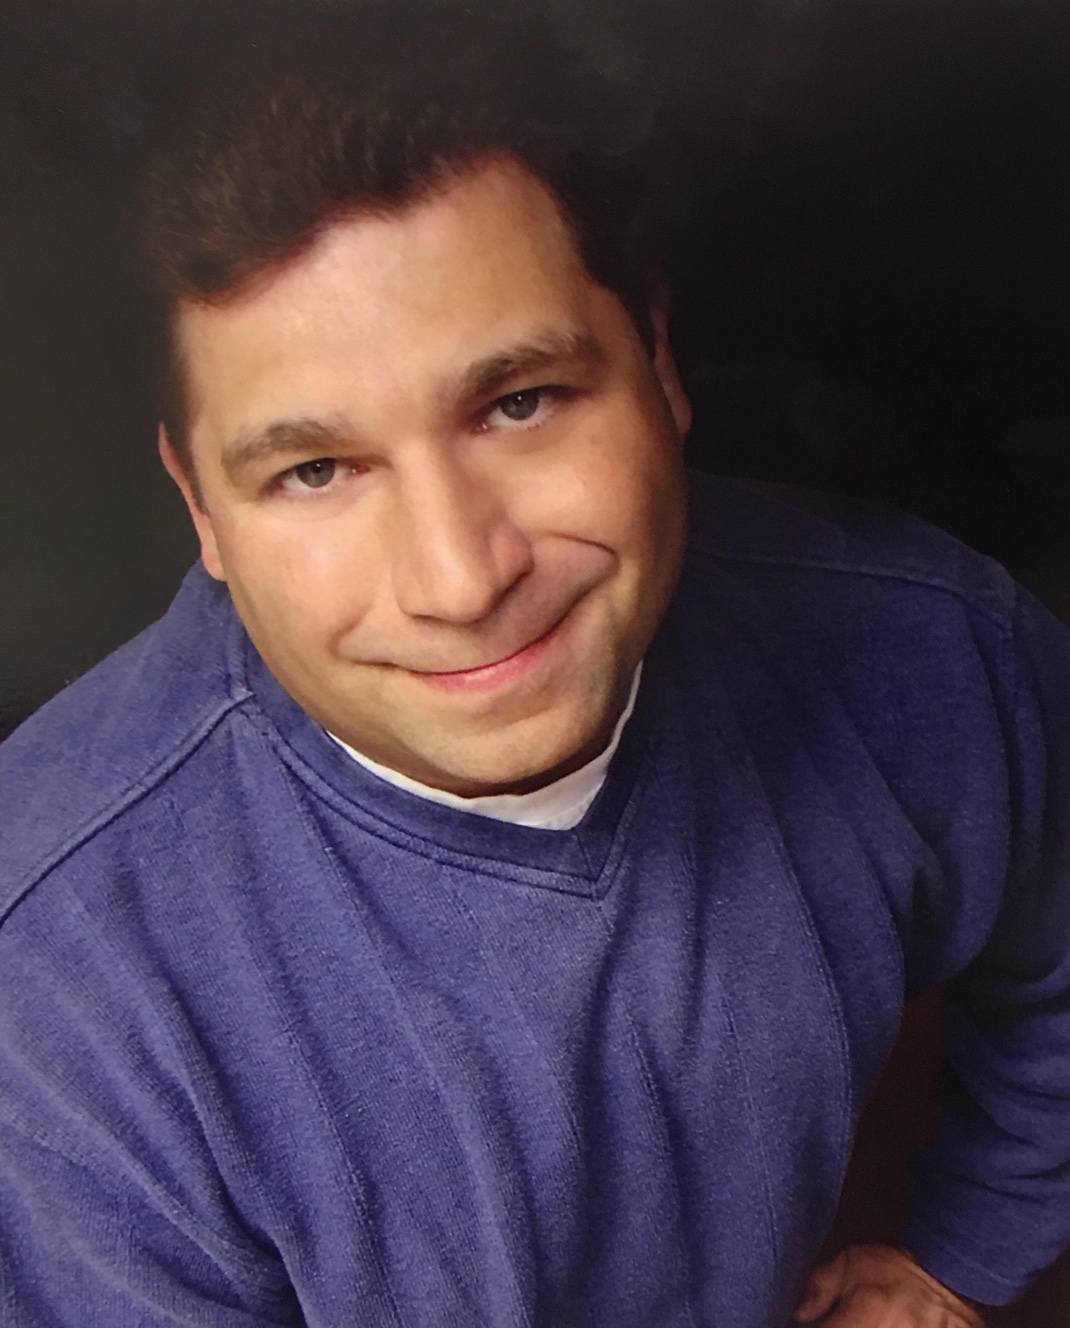 Mike W. | Actor + Spokesperson